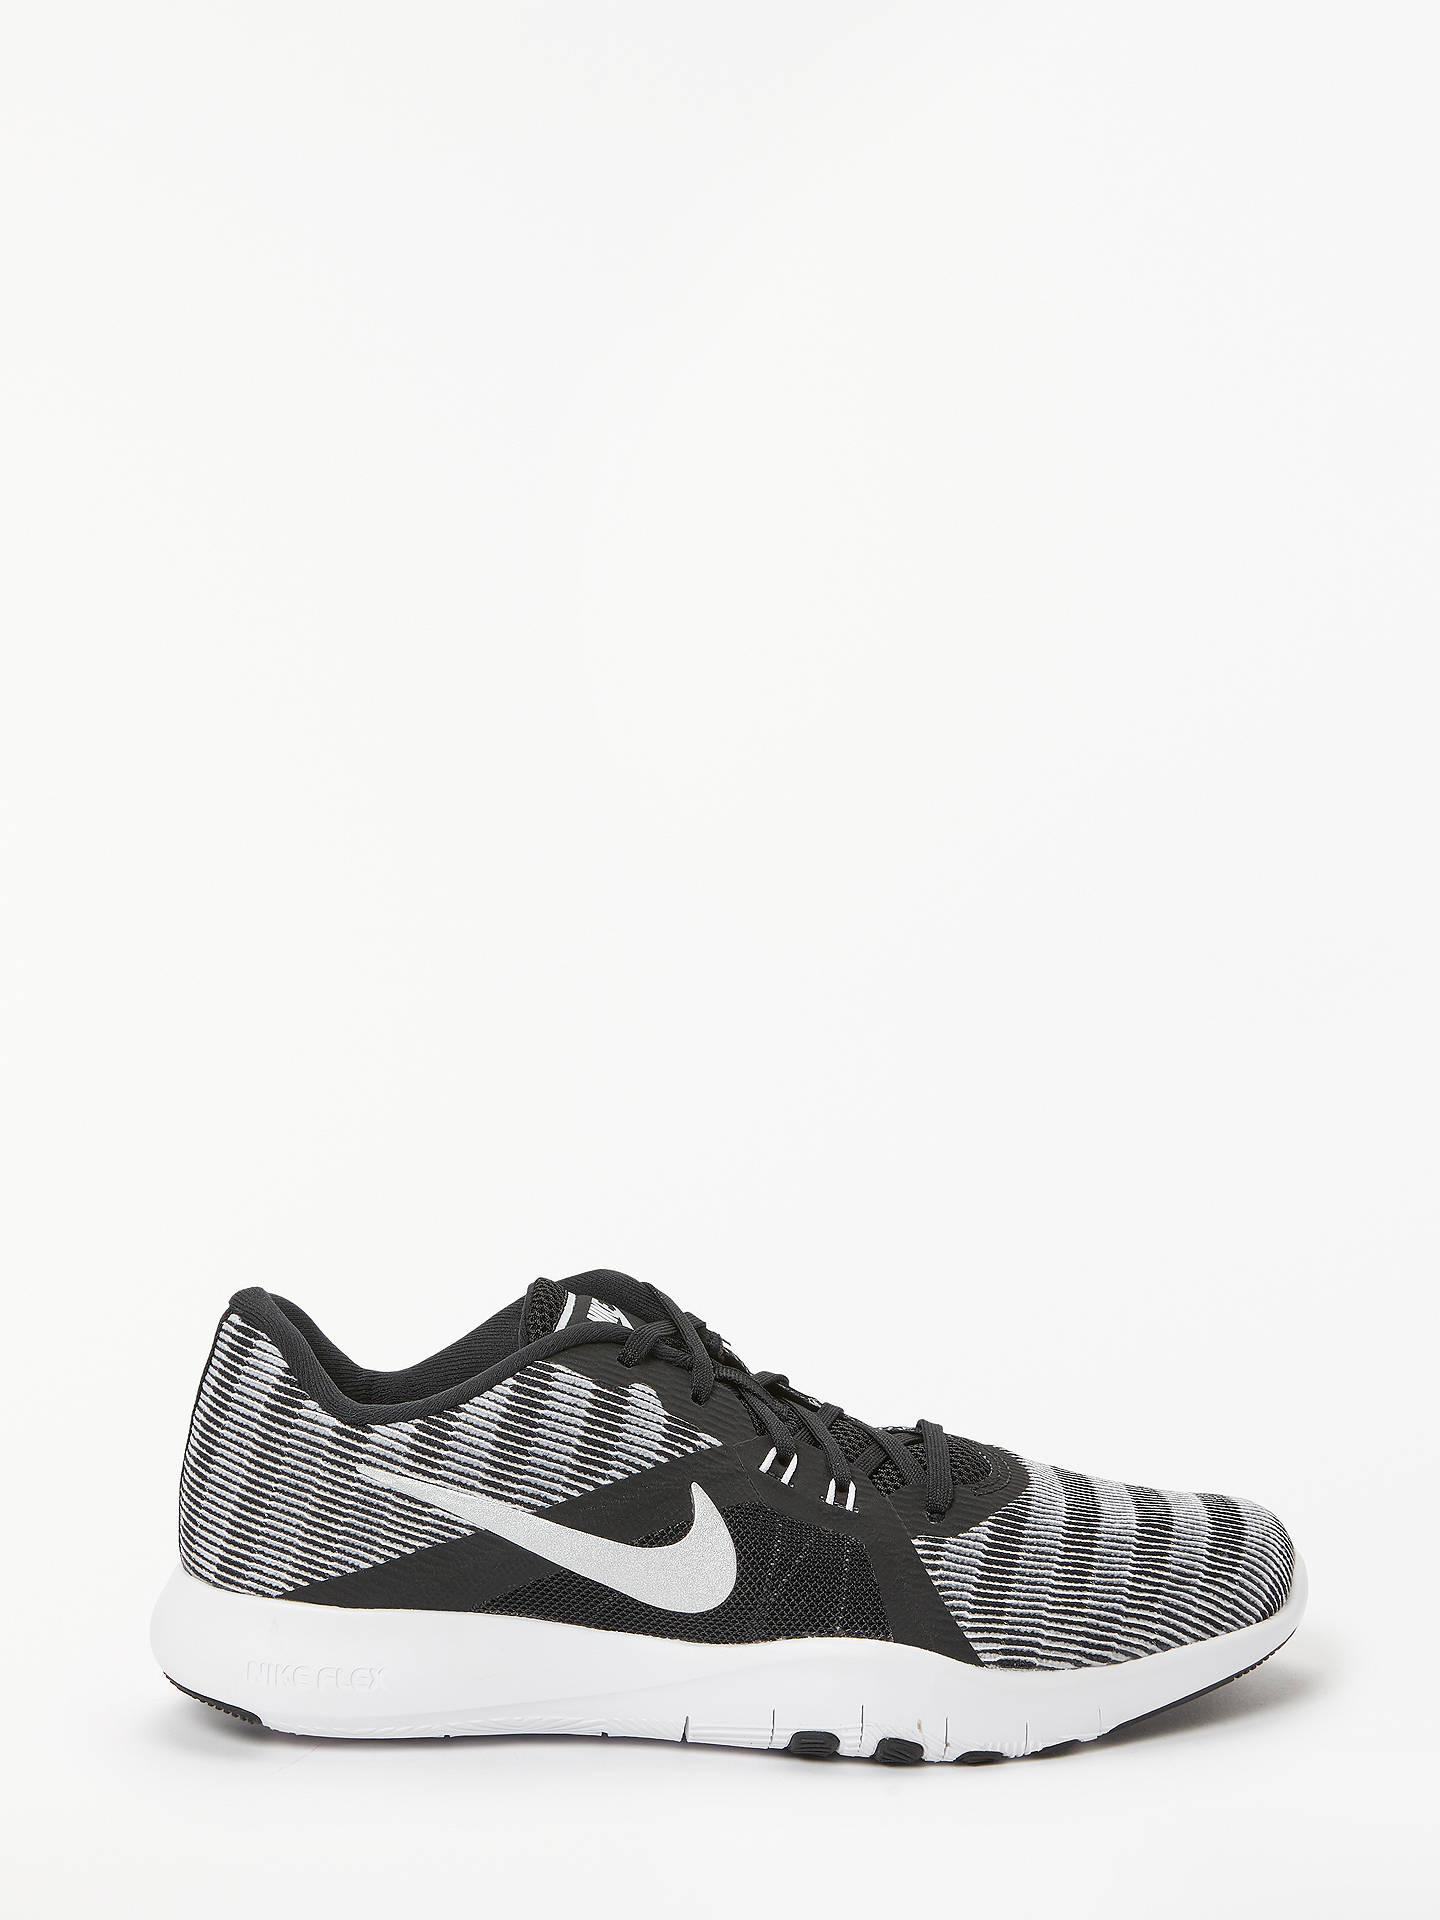 c00c75d4bba8 Nike Flex TR 8 Women s Training Shoes at John Lewis   Partners